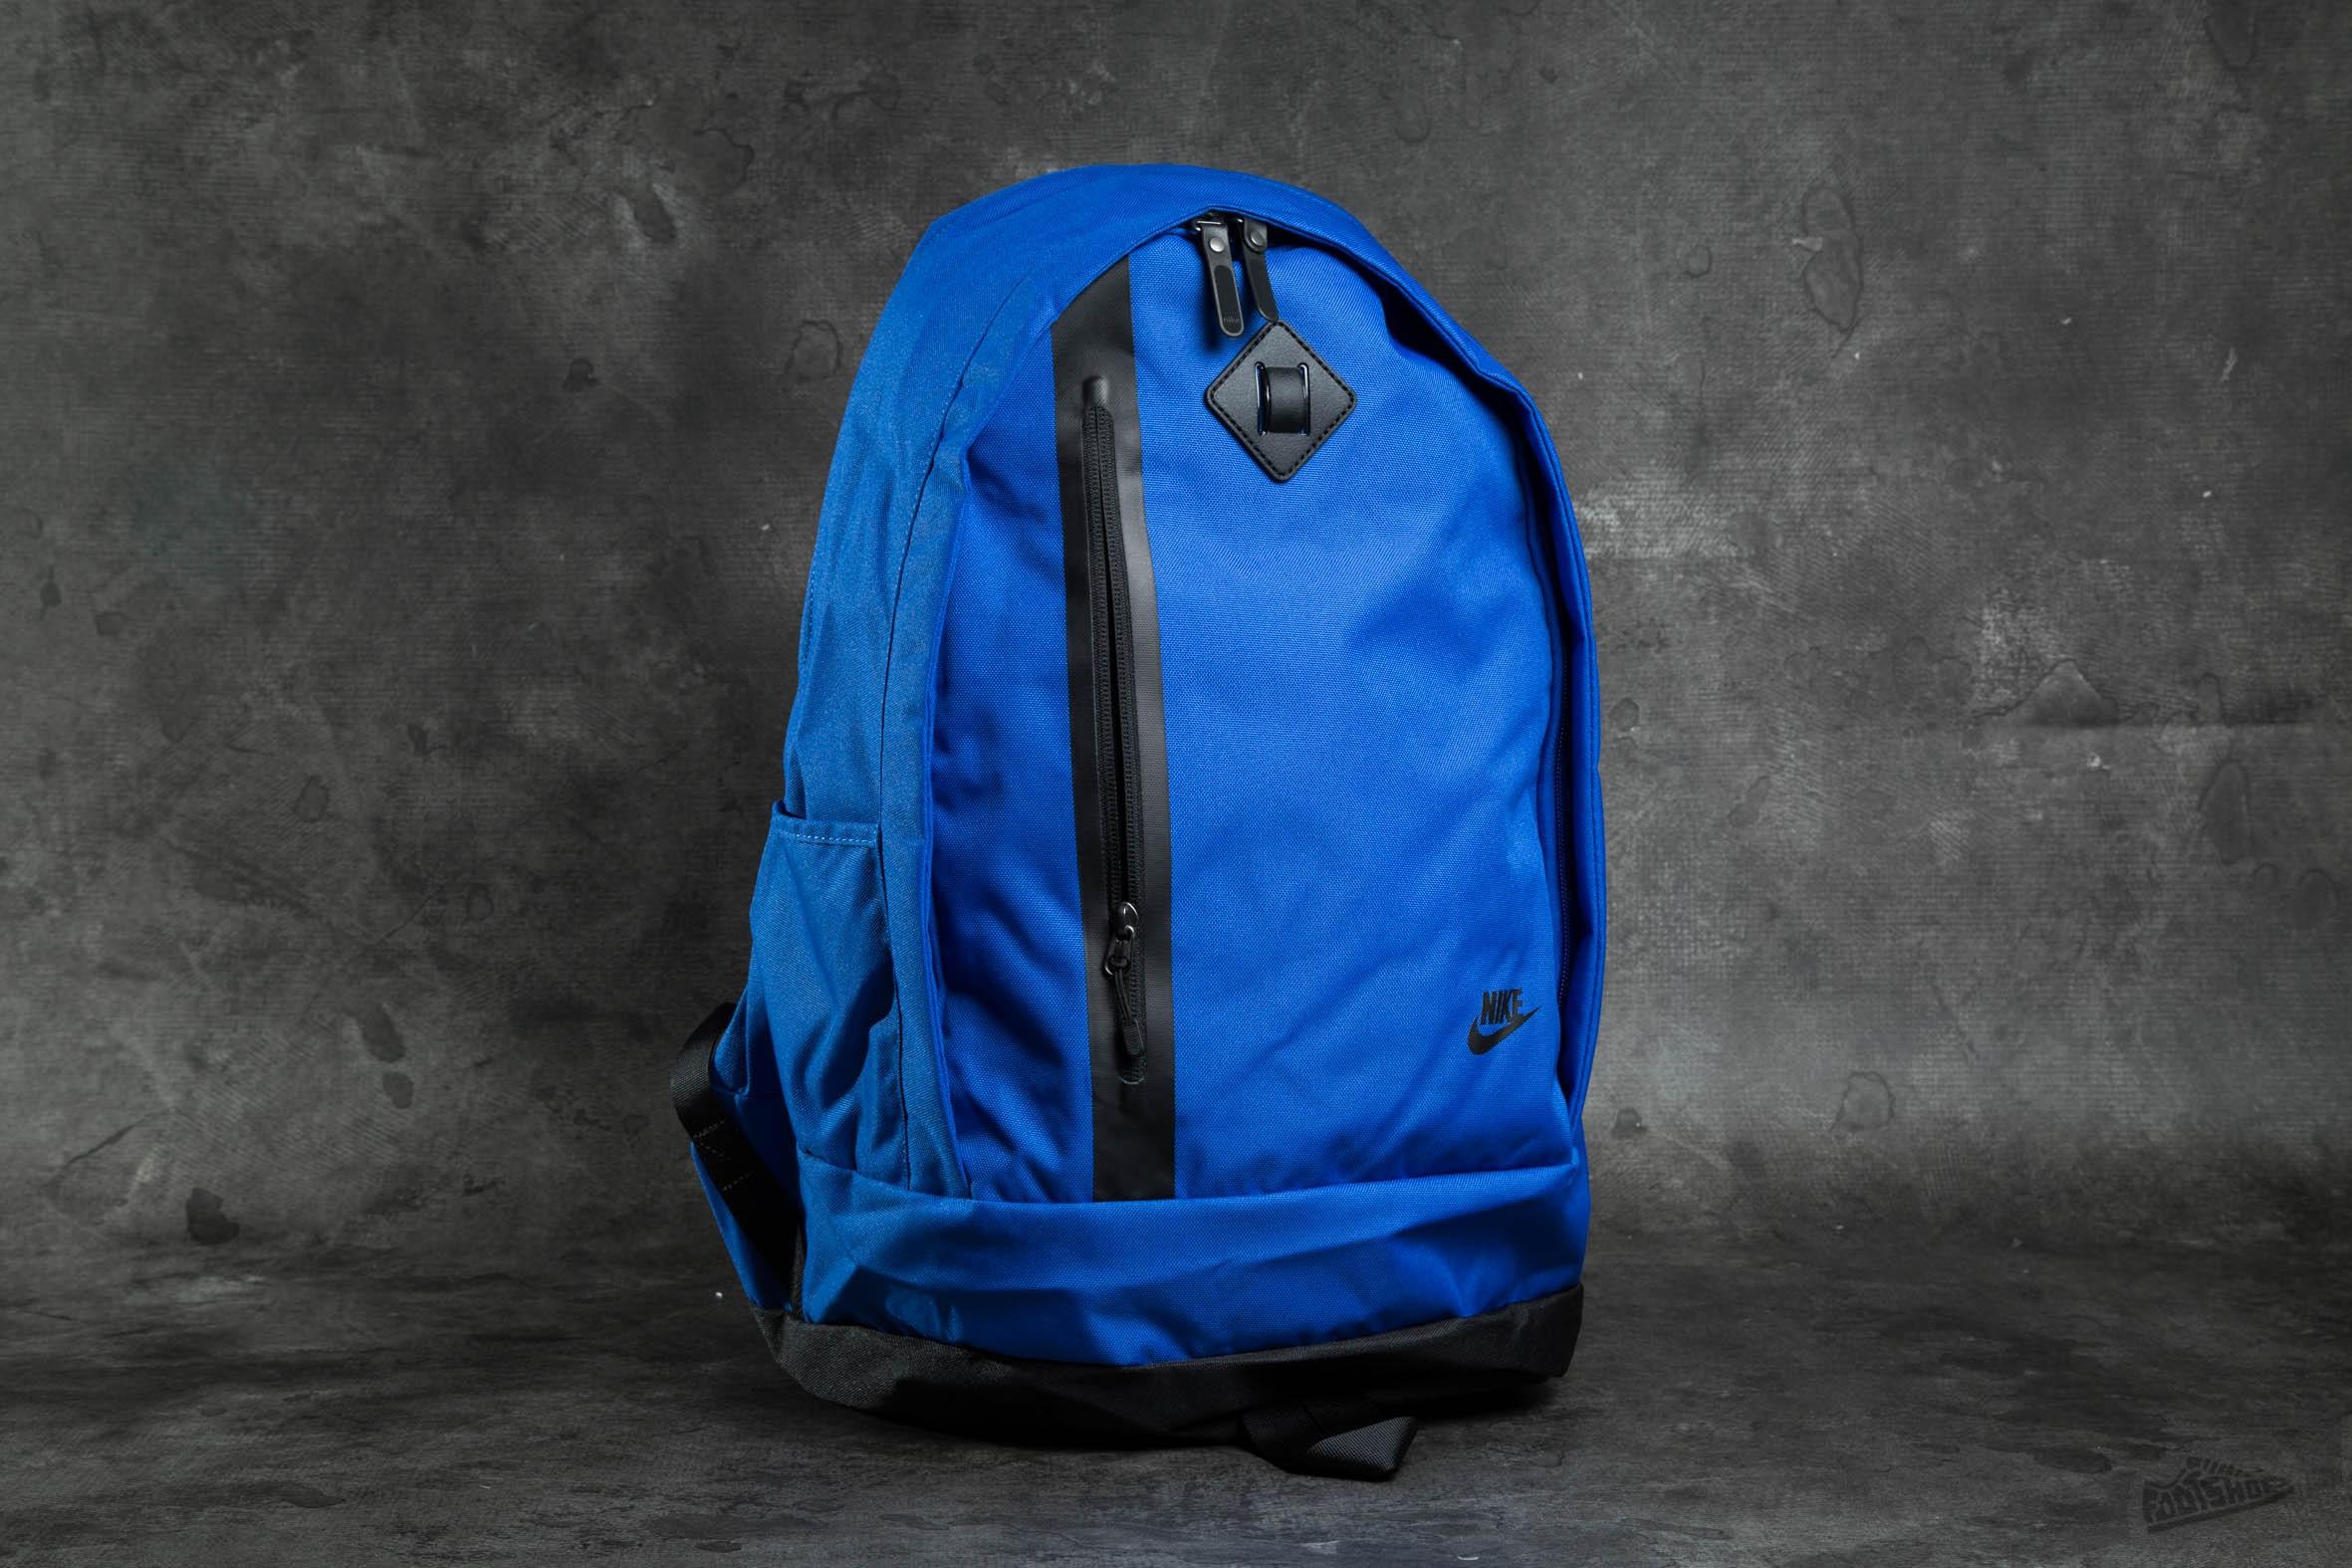 bb997c035b4e9 Nike Cheyenne 3.0 Solid Blue/ Black | Footshop